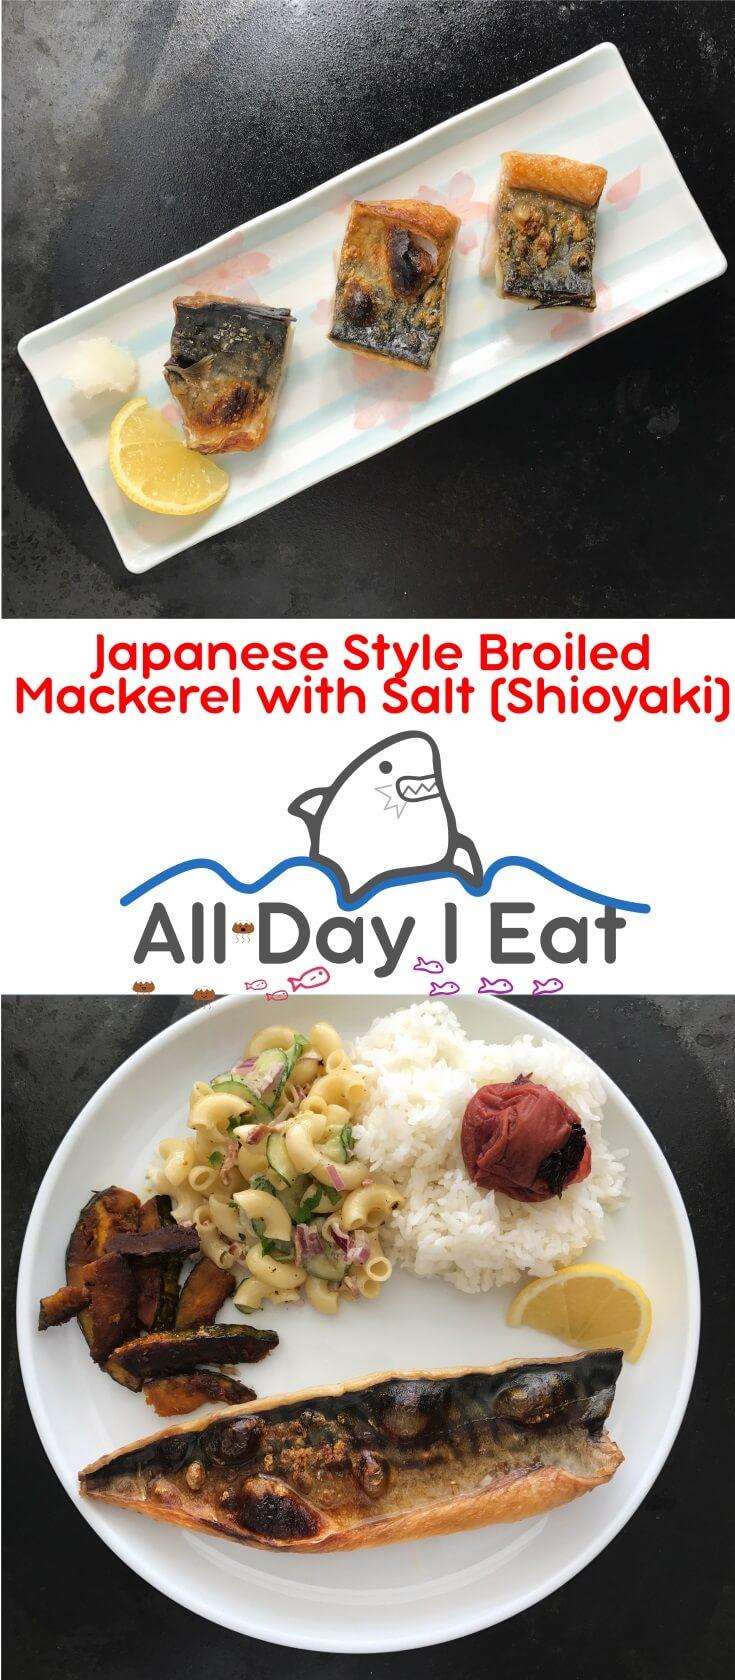 Japanese Style Broiled Mackerel with Salt (Shioyaki). One of the most tasty ways to make mackerel. Just add a bit of lemon + grated daikon! | www.alldayieat.com